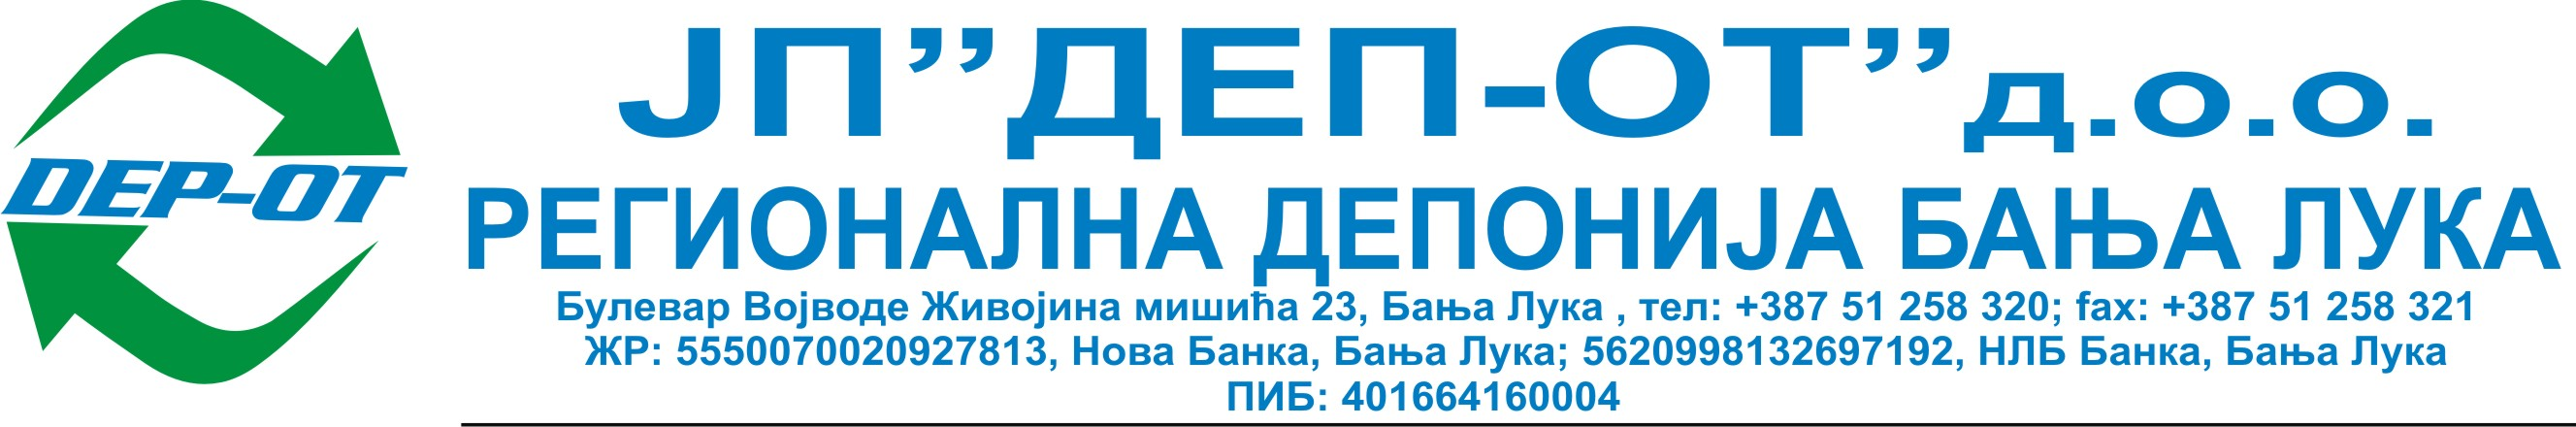 "J.P.""DEP-OT"" Banja Luka"